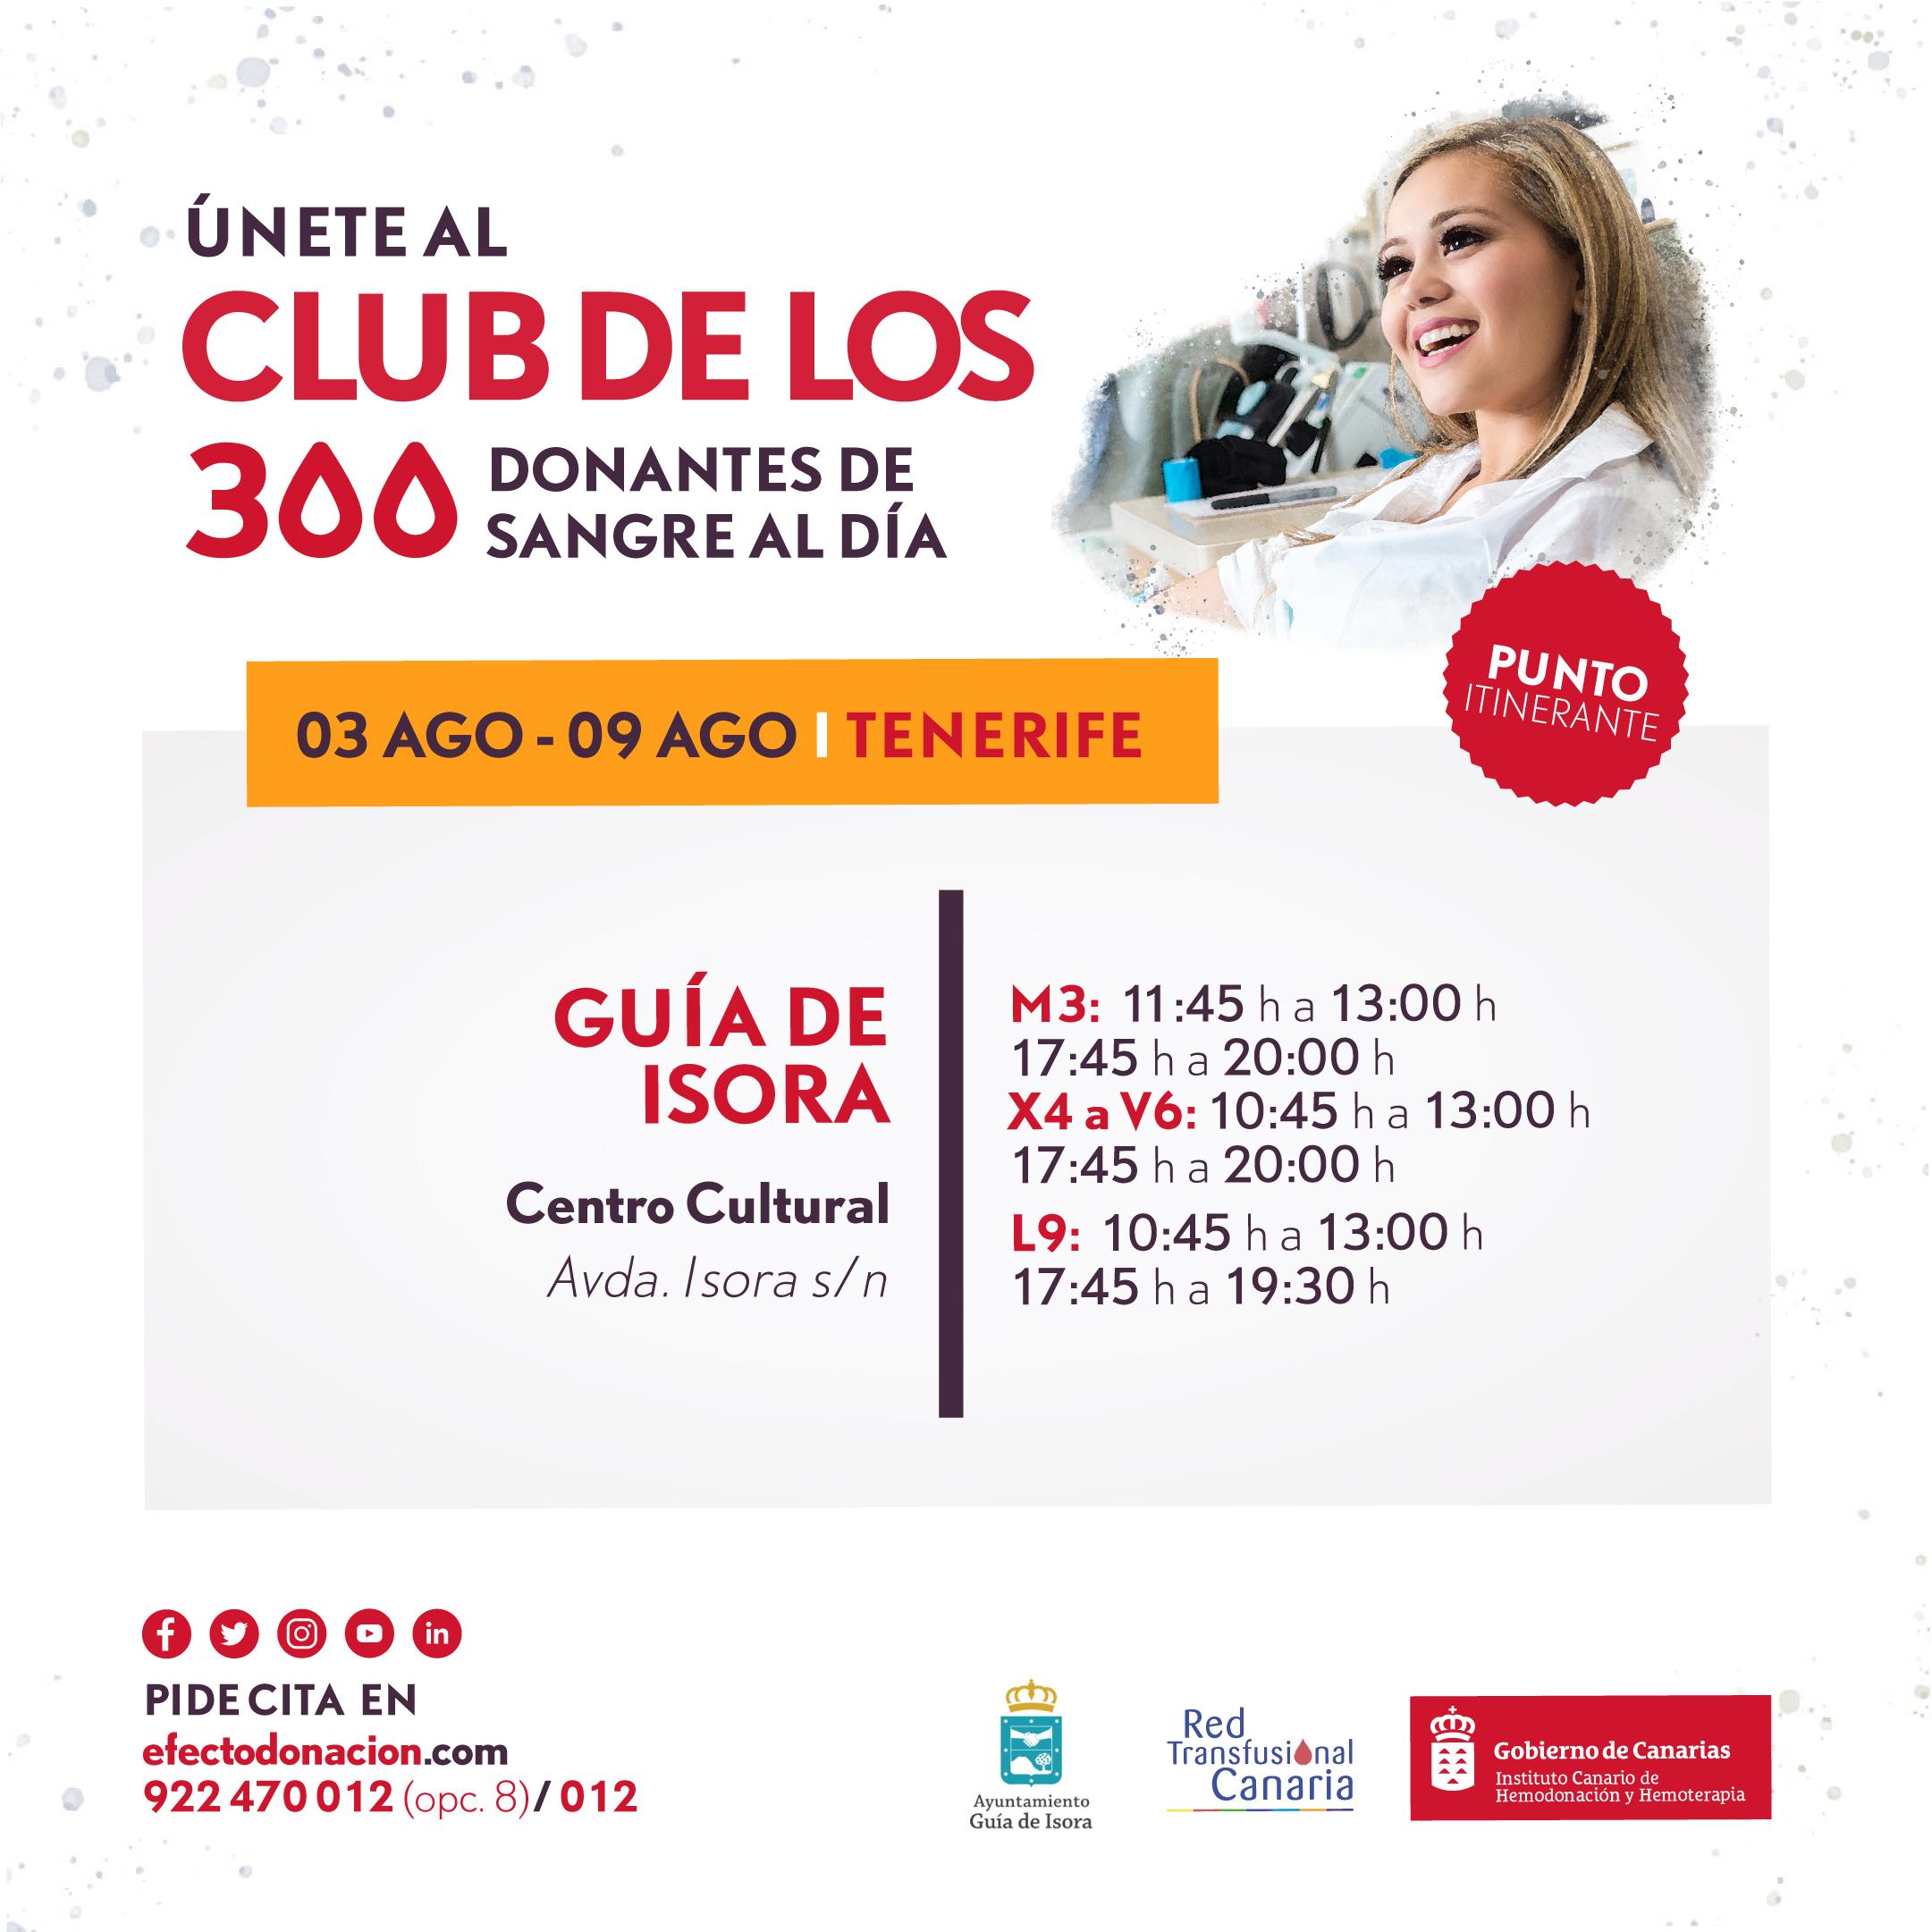 GUIA DE ISORA (1) (1)